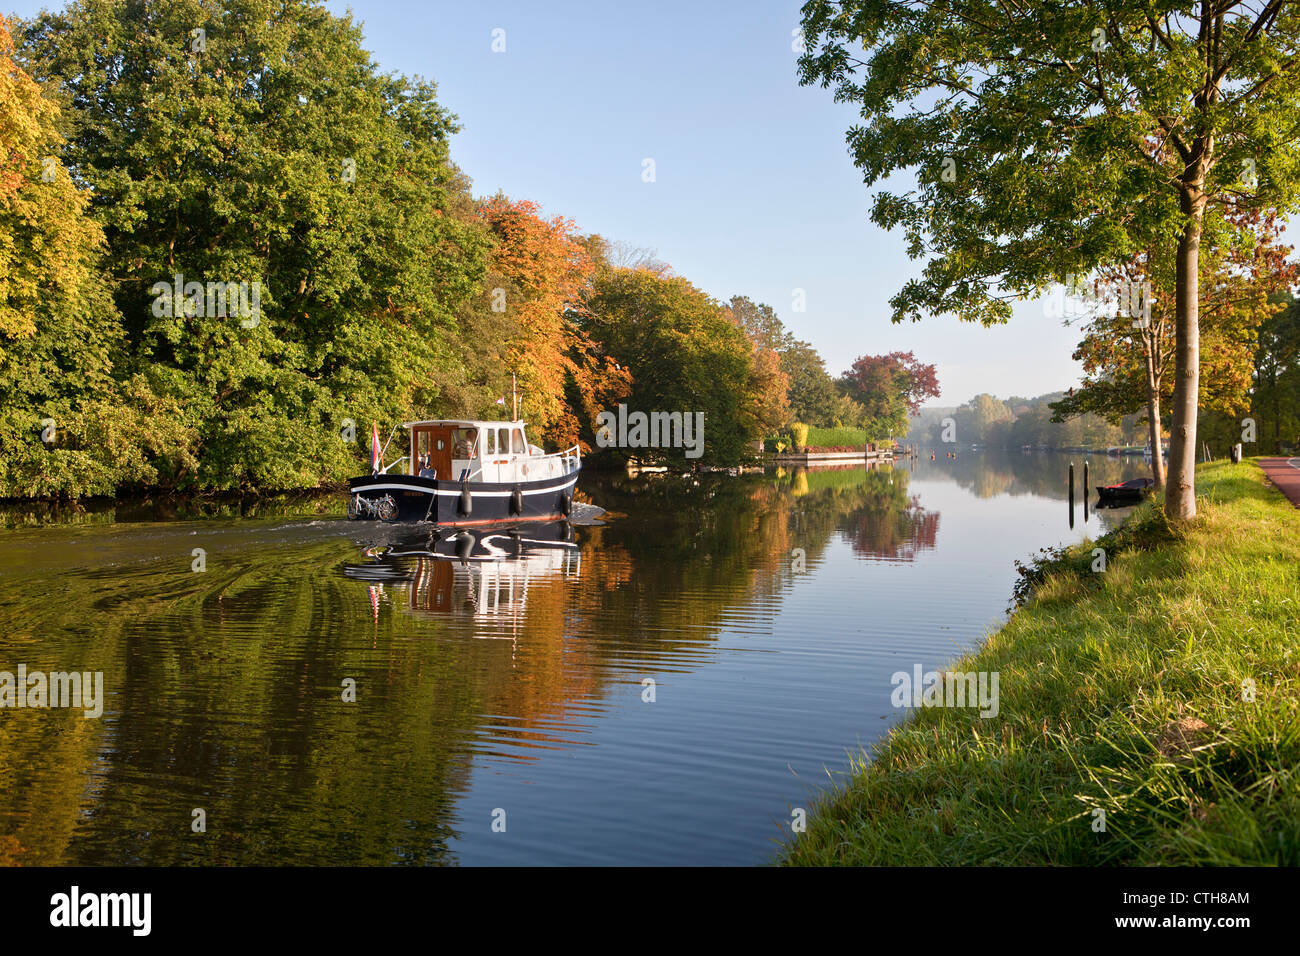 The Netherlands, Breukelen, Pleasure boat on the river Vecht. - Stock Image